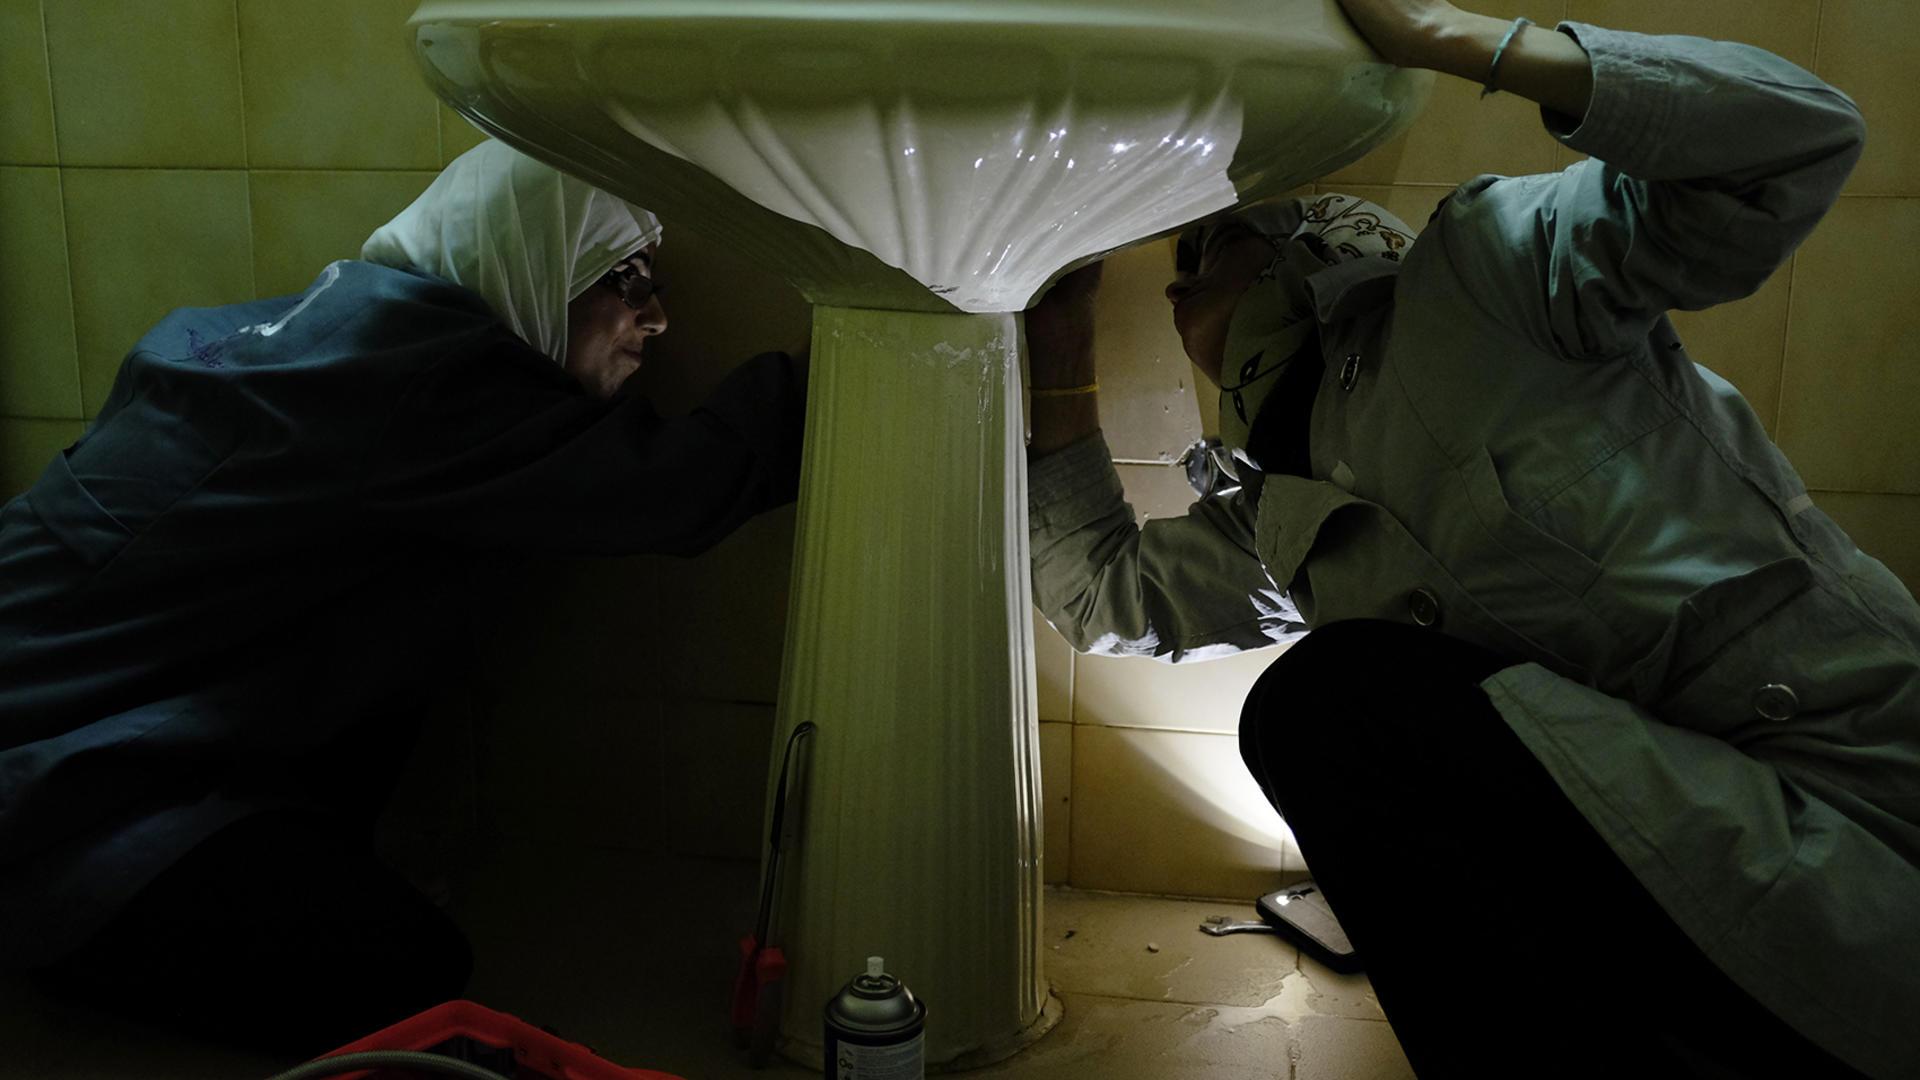 Two Syrian women plumbers in Jordan